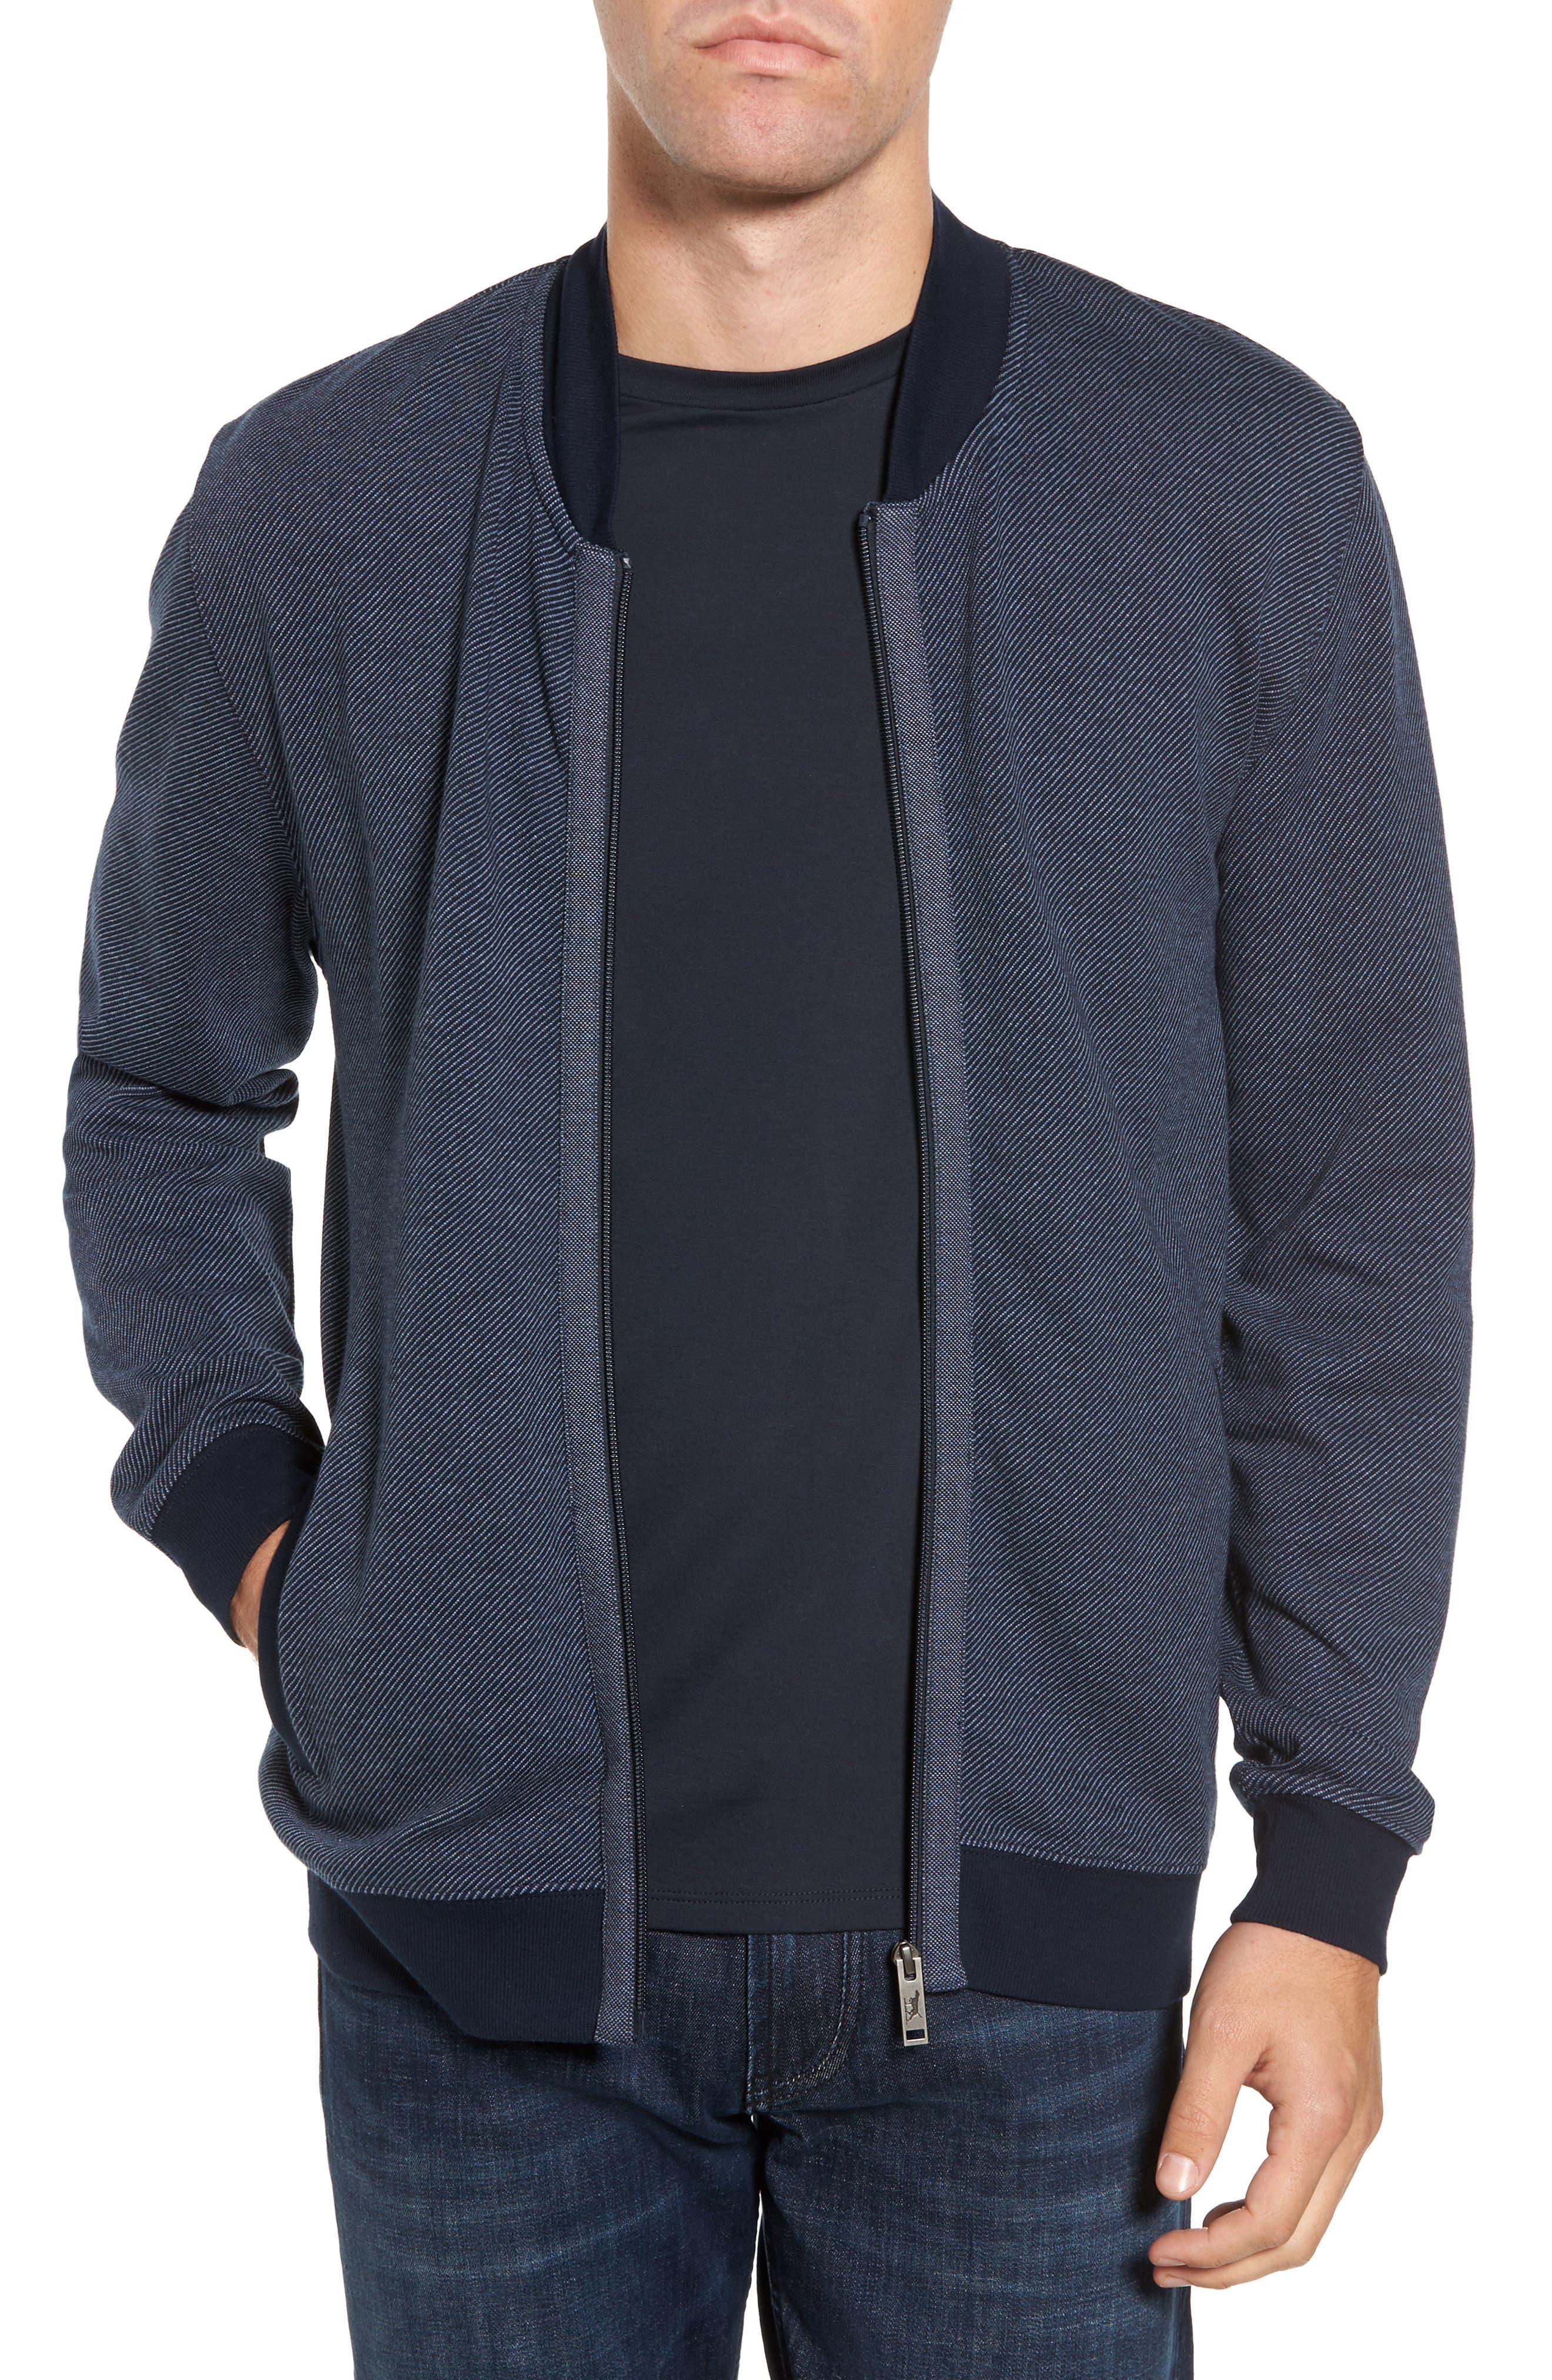 Alderson Ave Fleece Jacket,                             Main thumbnail 1, color,                             Navy